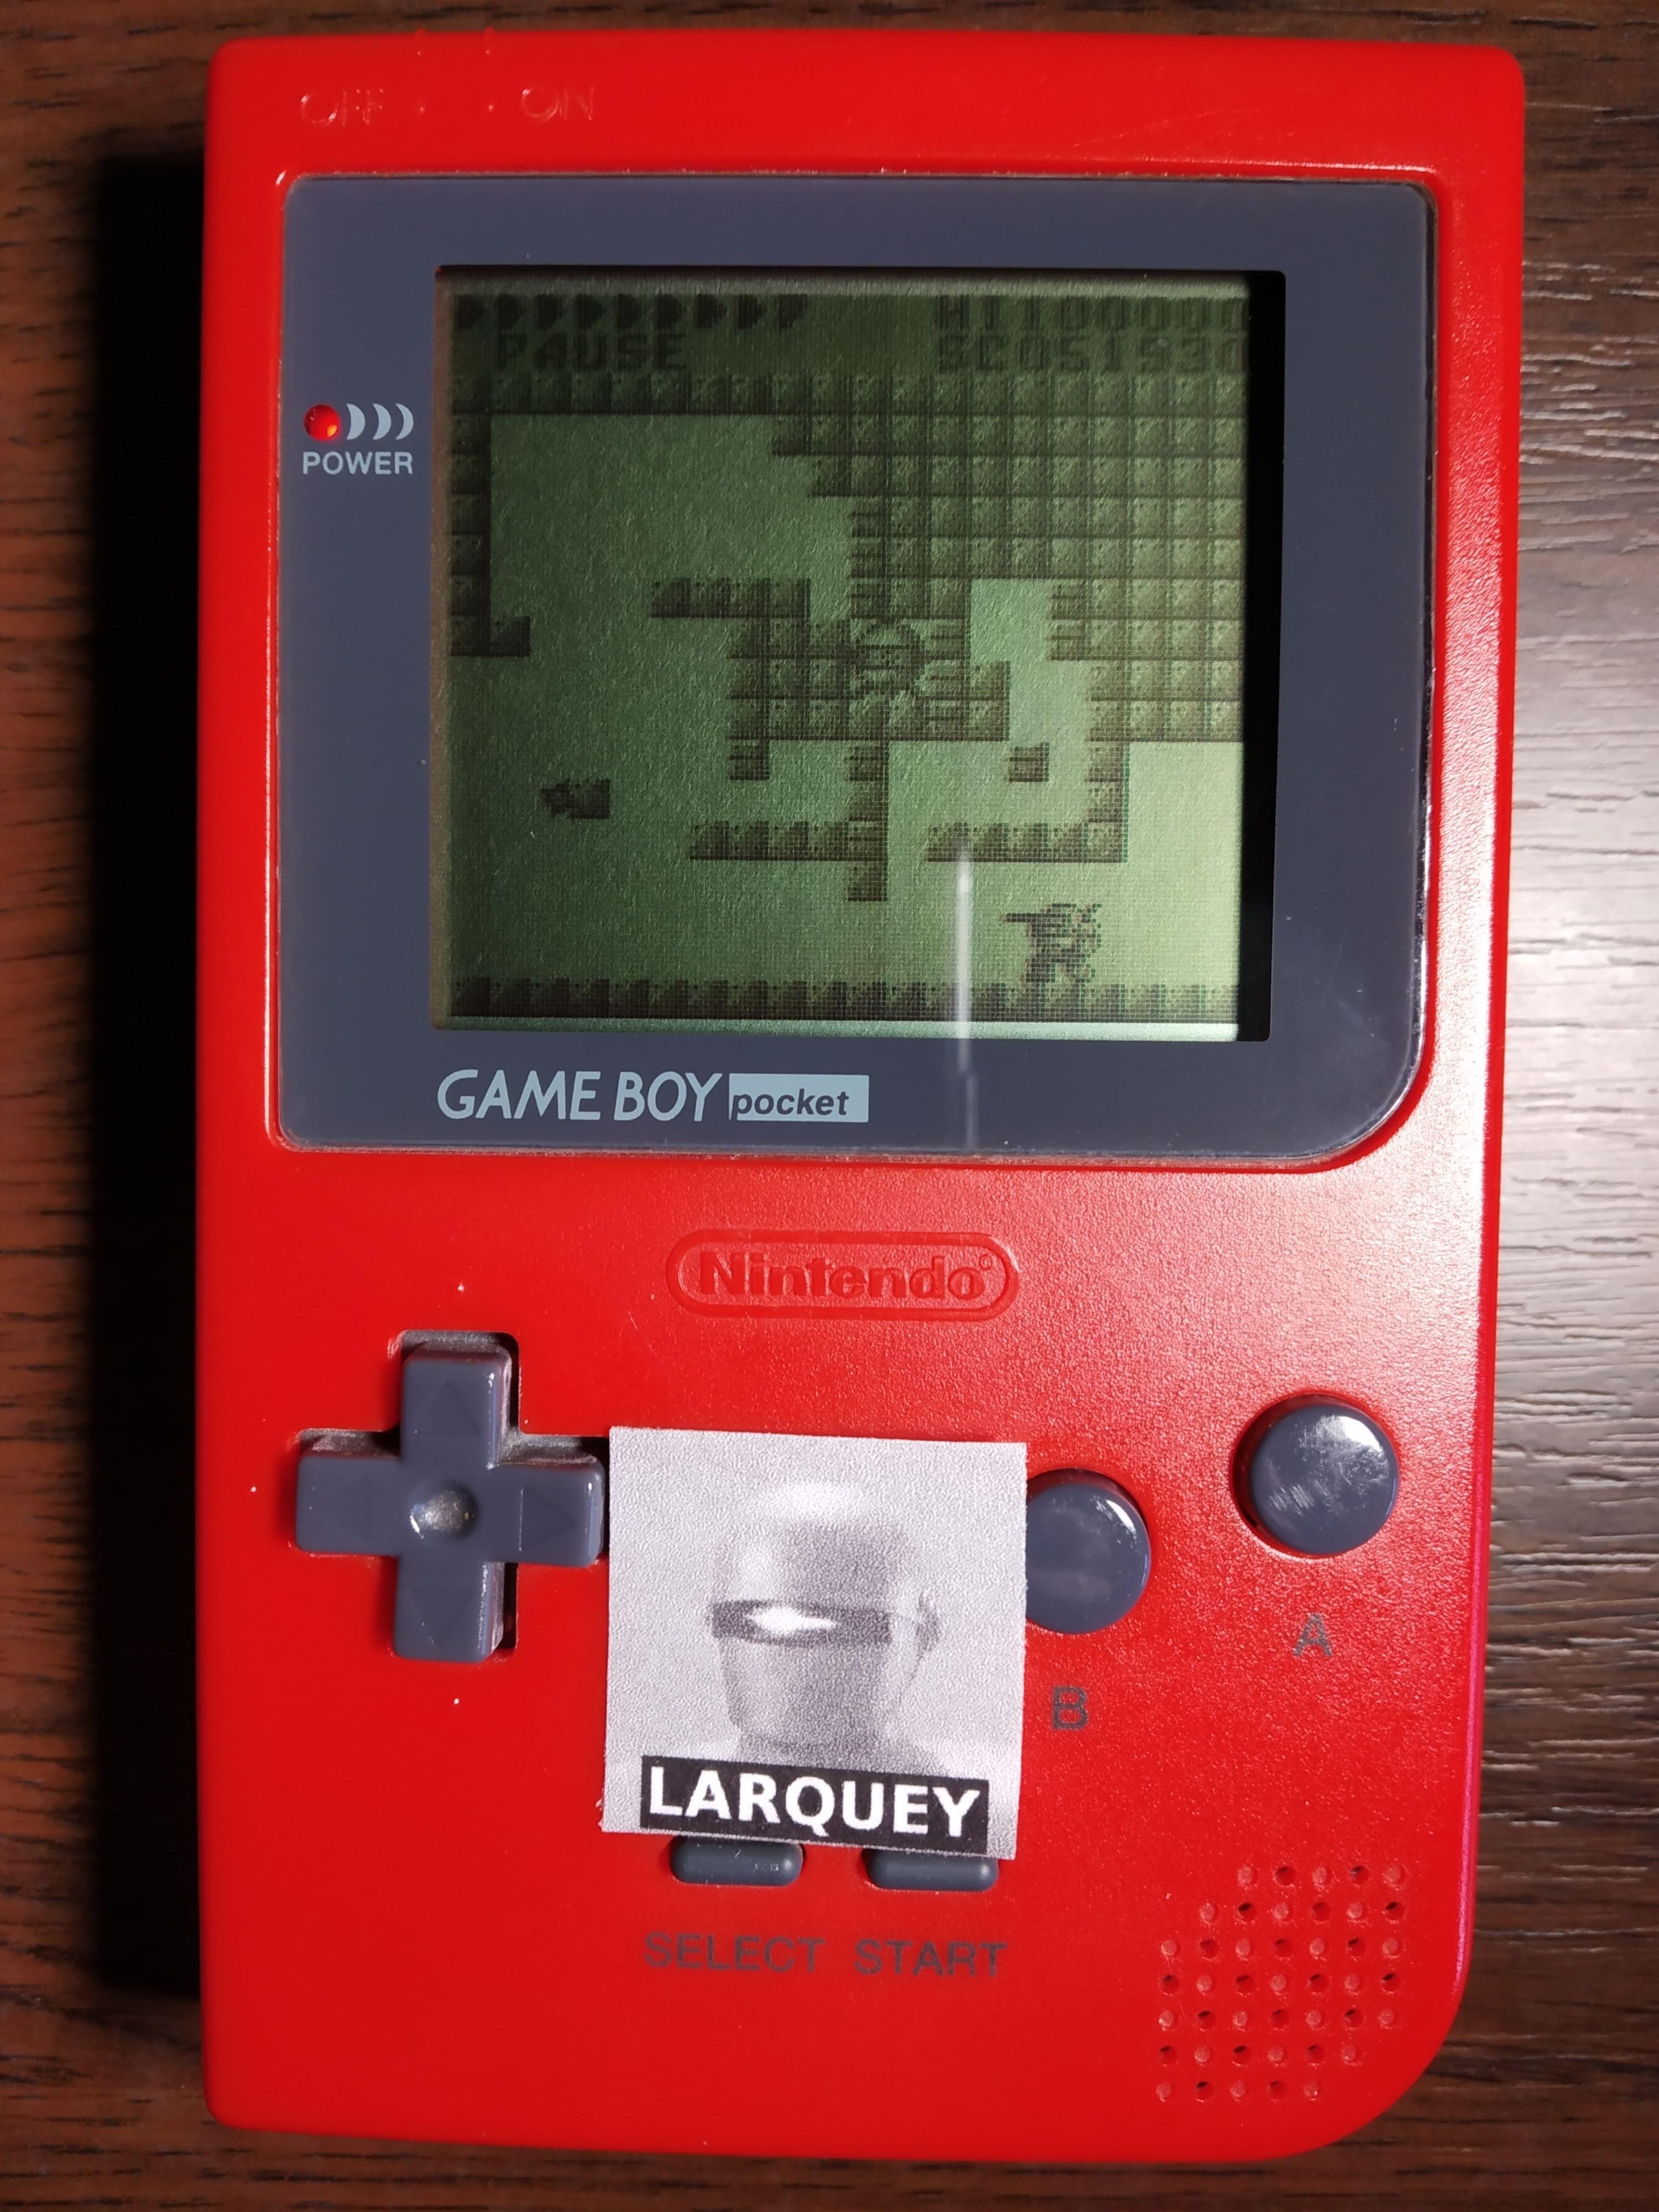 Larquey: After Burst [Normal] (Game Boy) 51,930 points on 2019-11-24 08:02:05